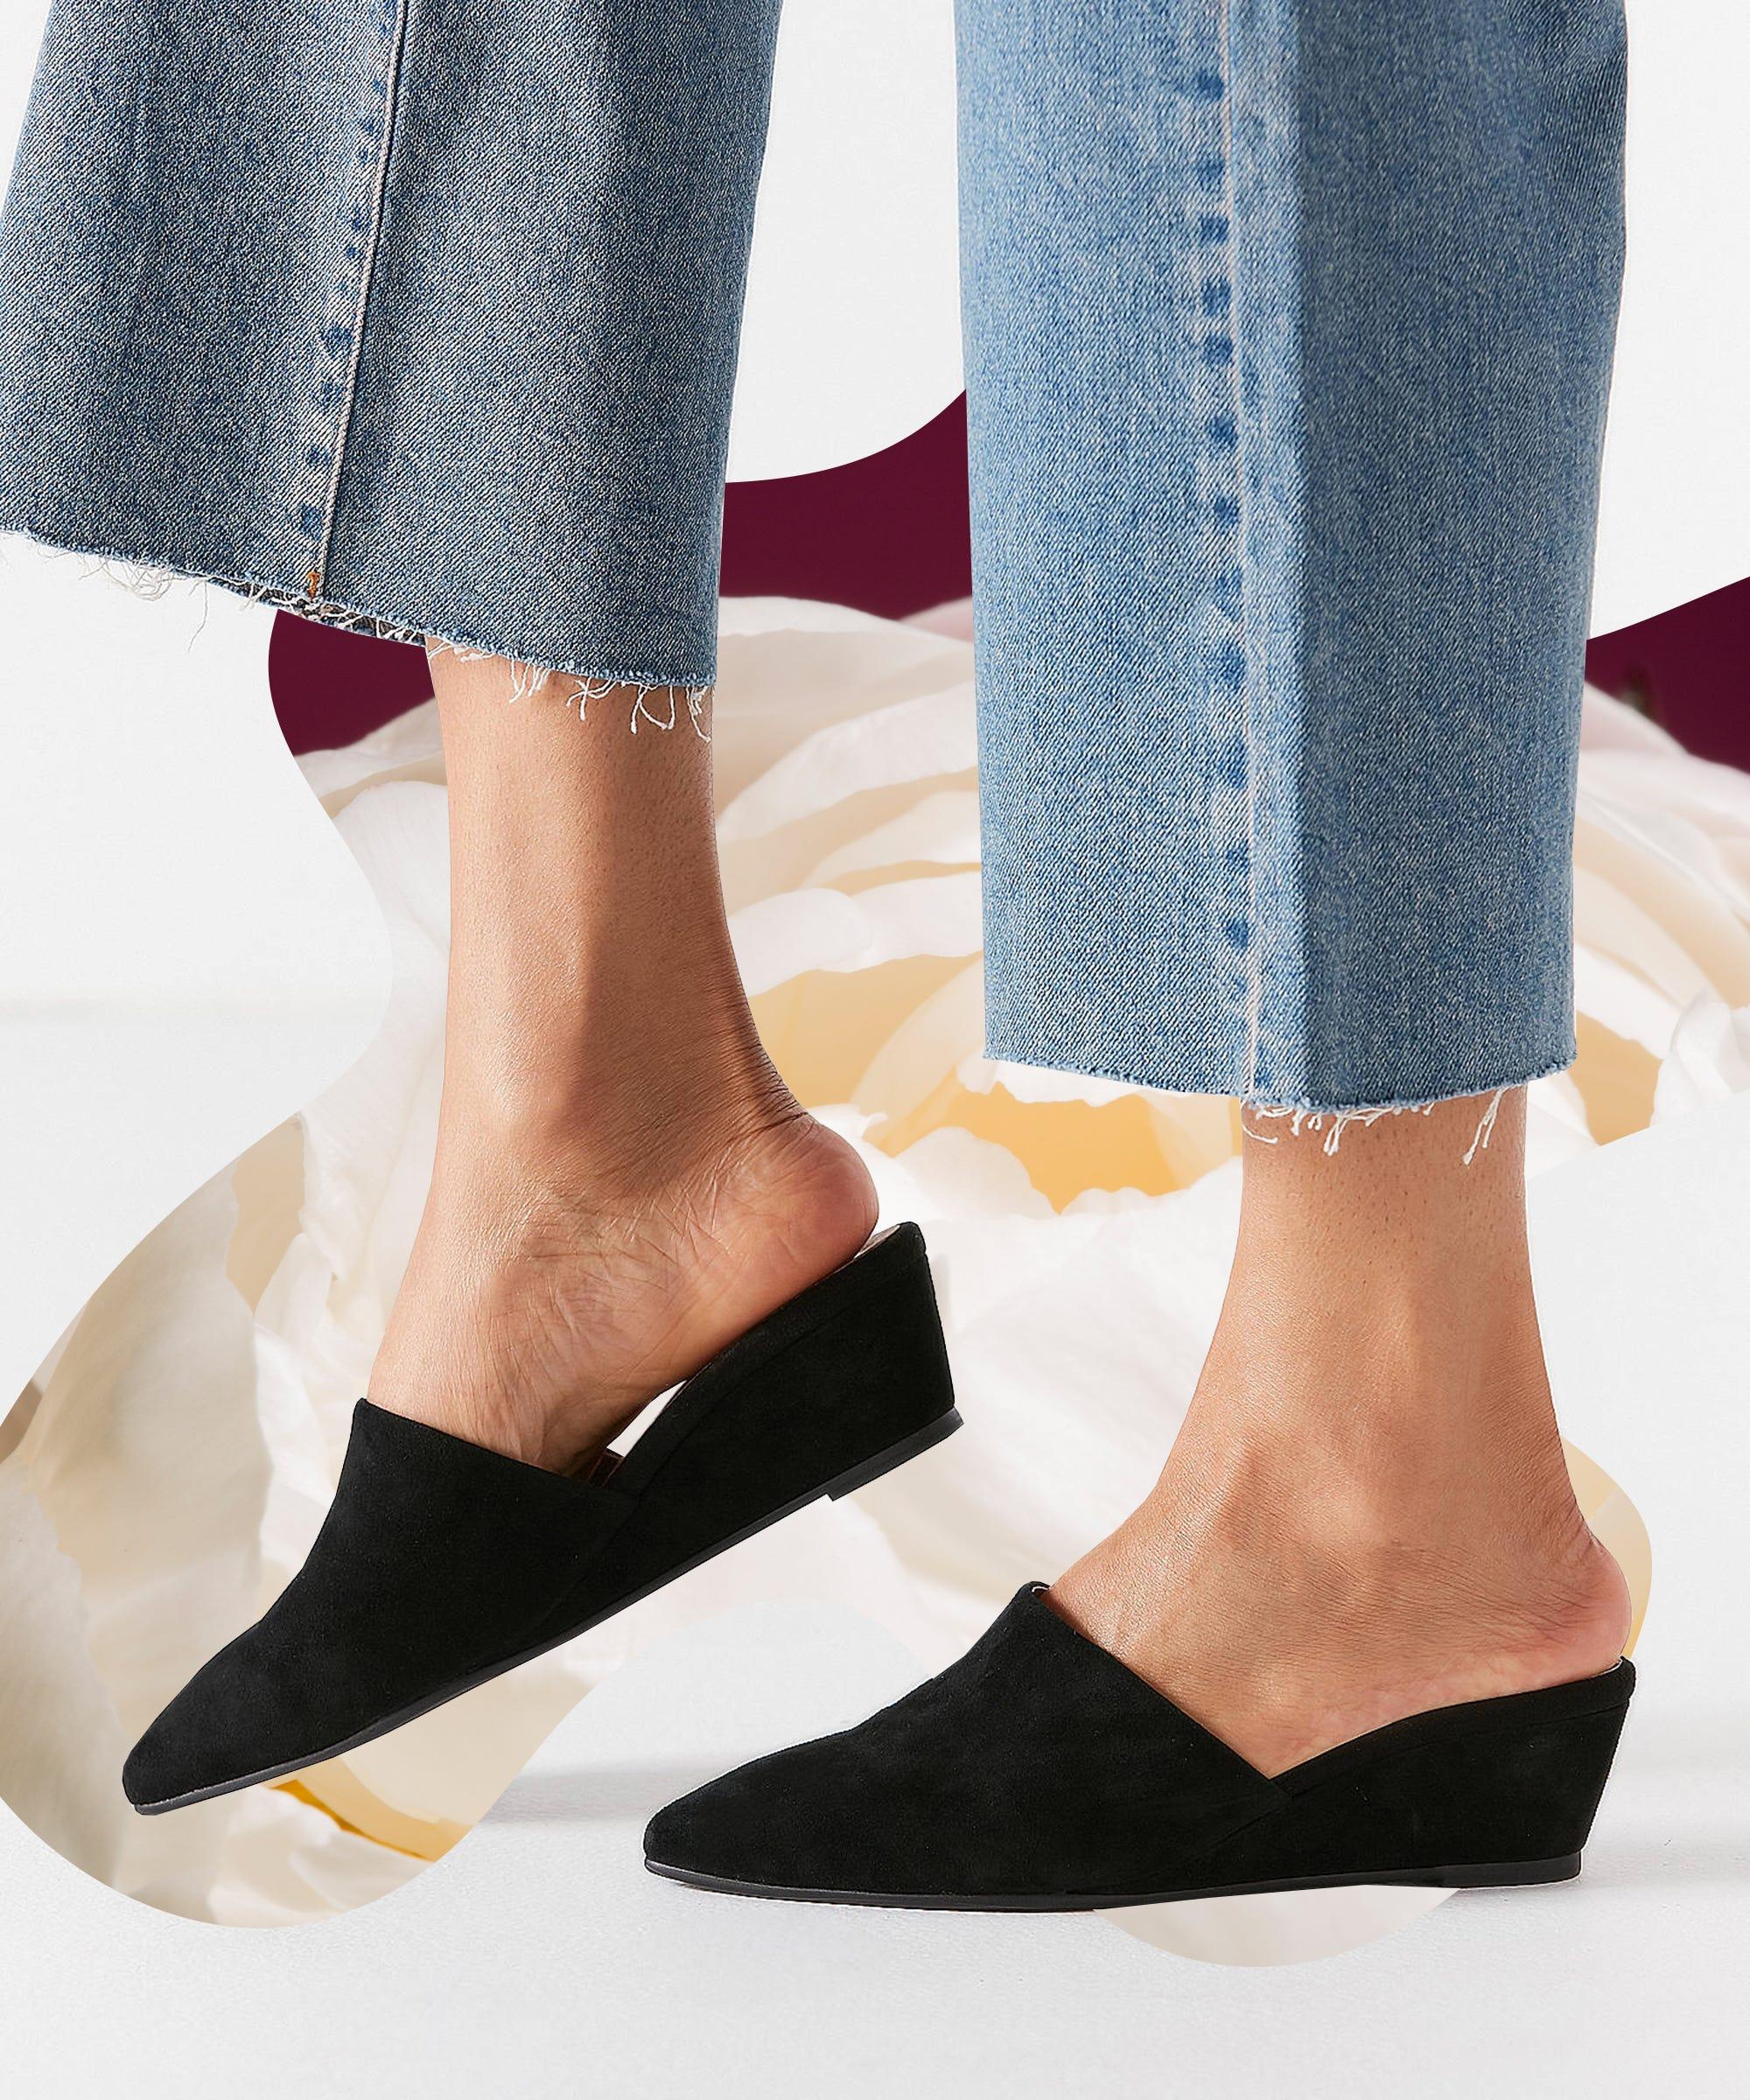 platform ankle comforter wedges comfortable refresh amazon strap mara platforms most womens com dp